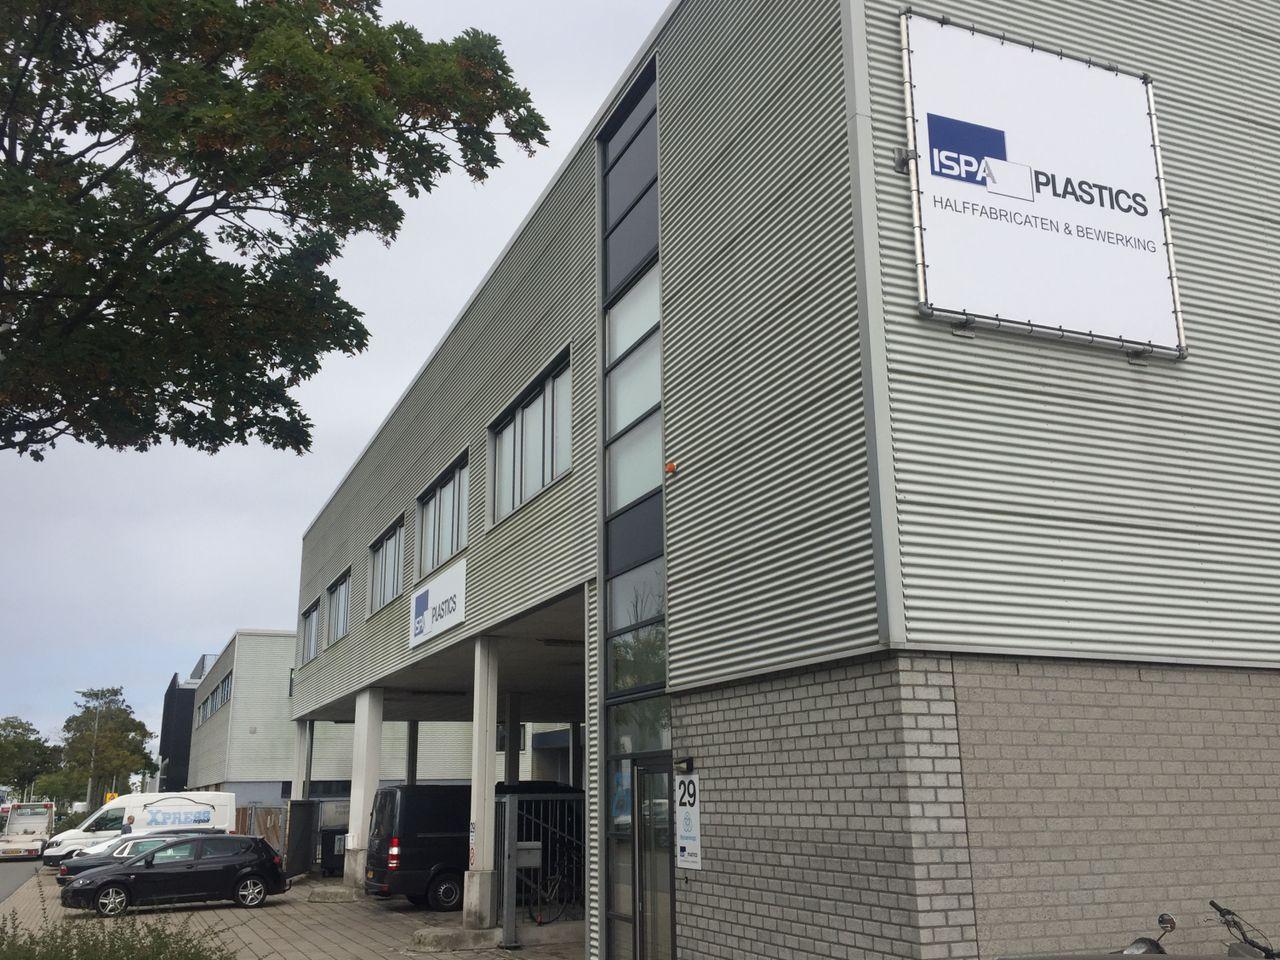 ISPA plastics pand Amsterdam